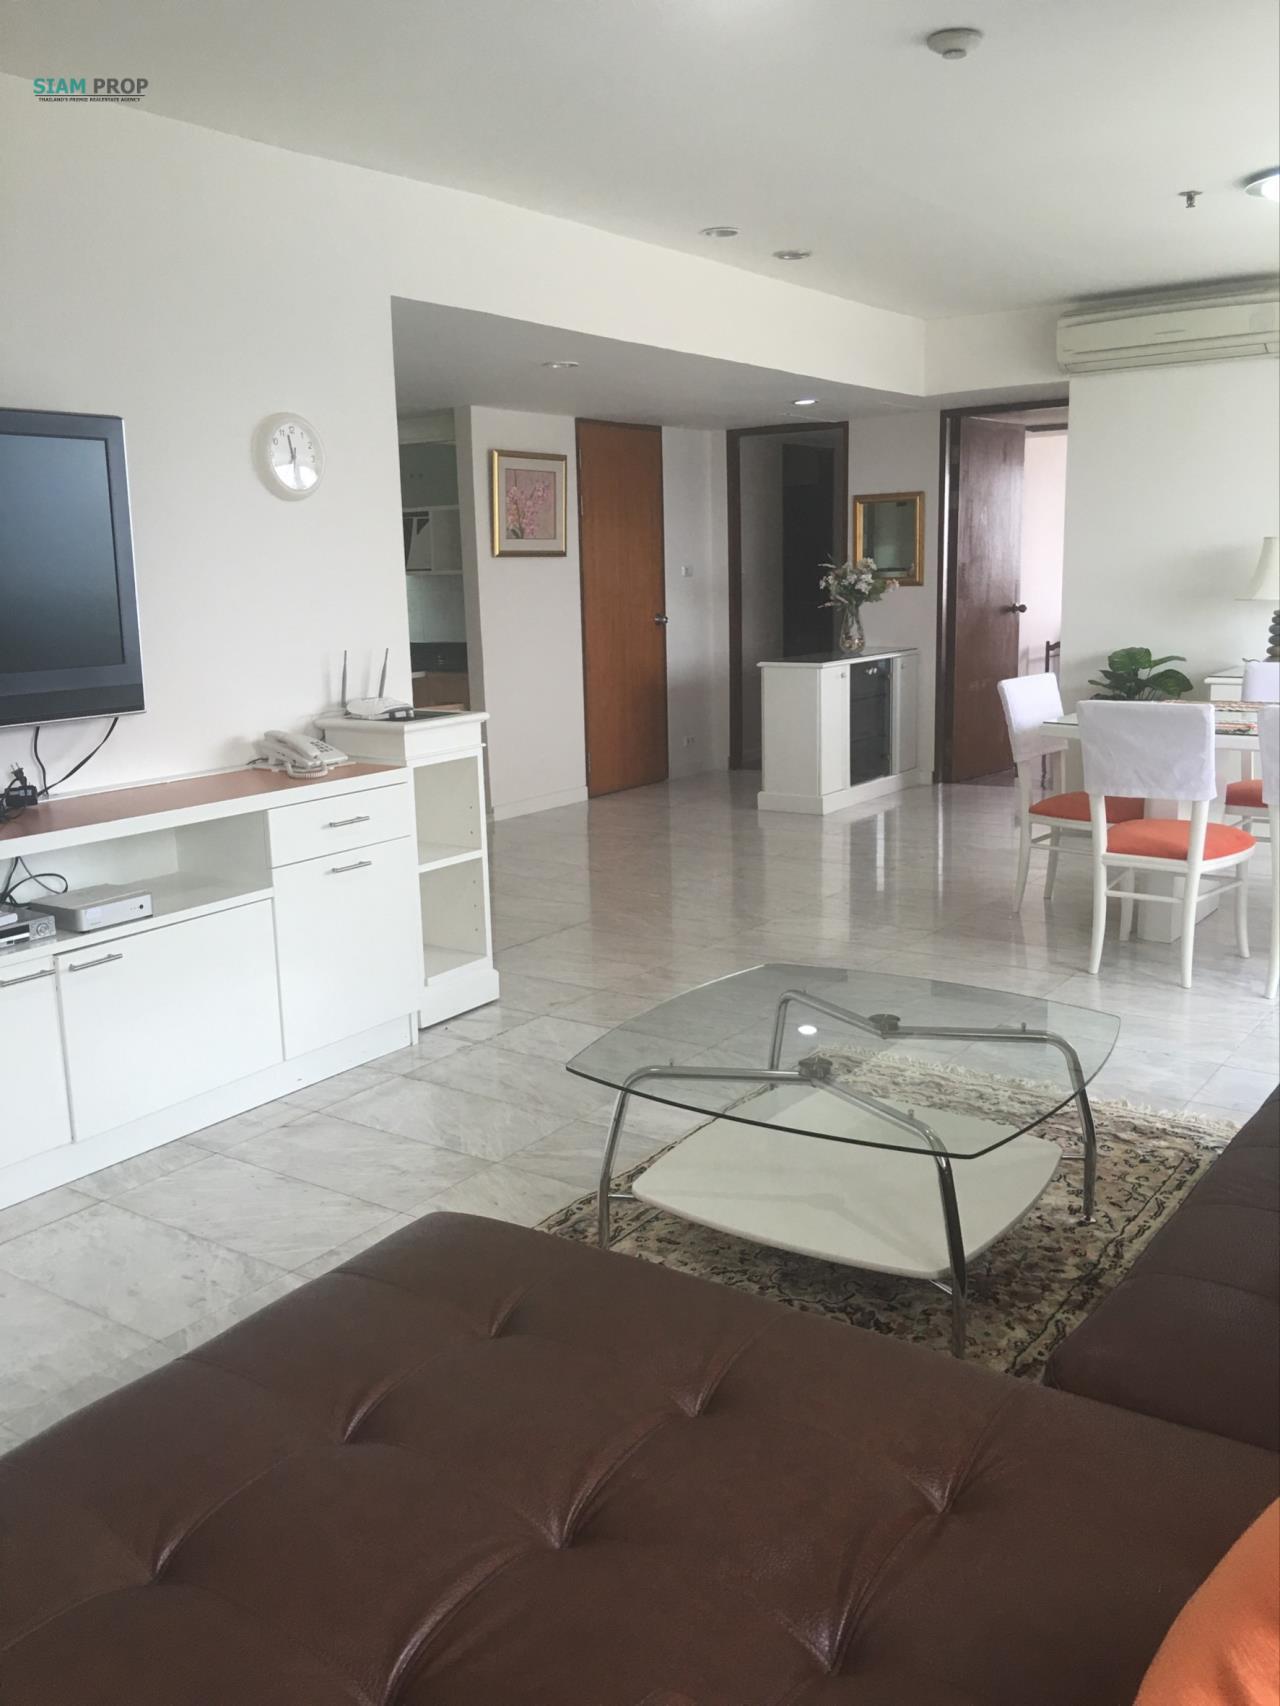 Siam Prop Agency's RENT Condo Baan Suanpetch 3 Bedrooms 2